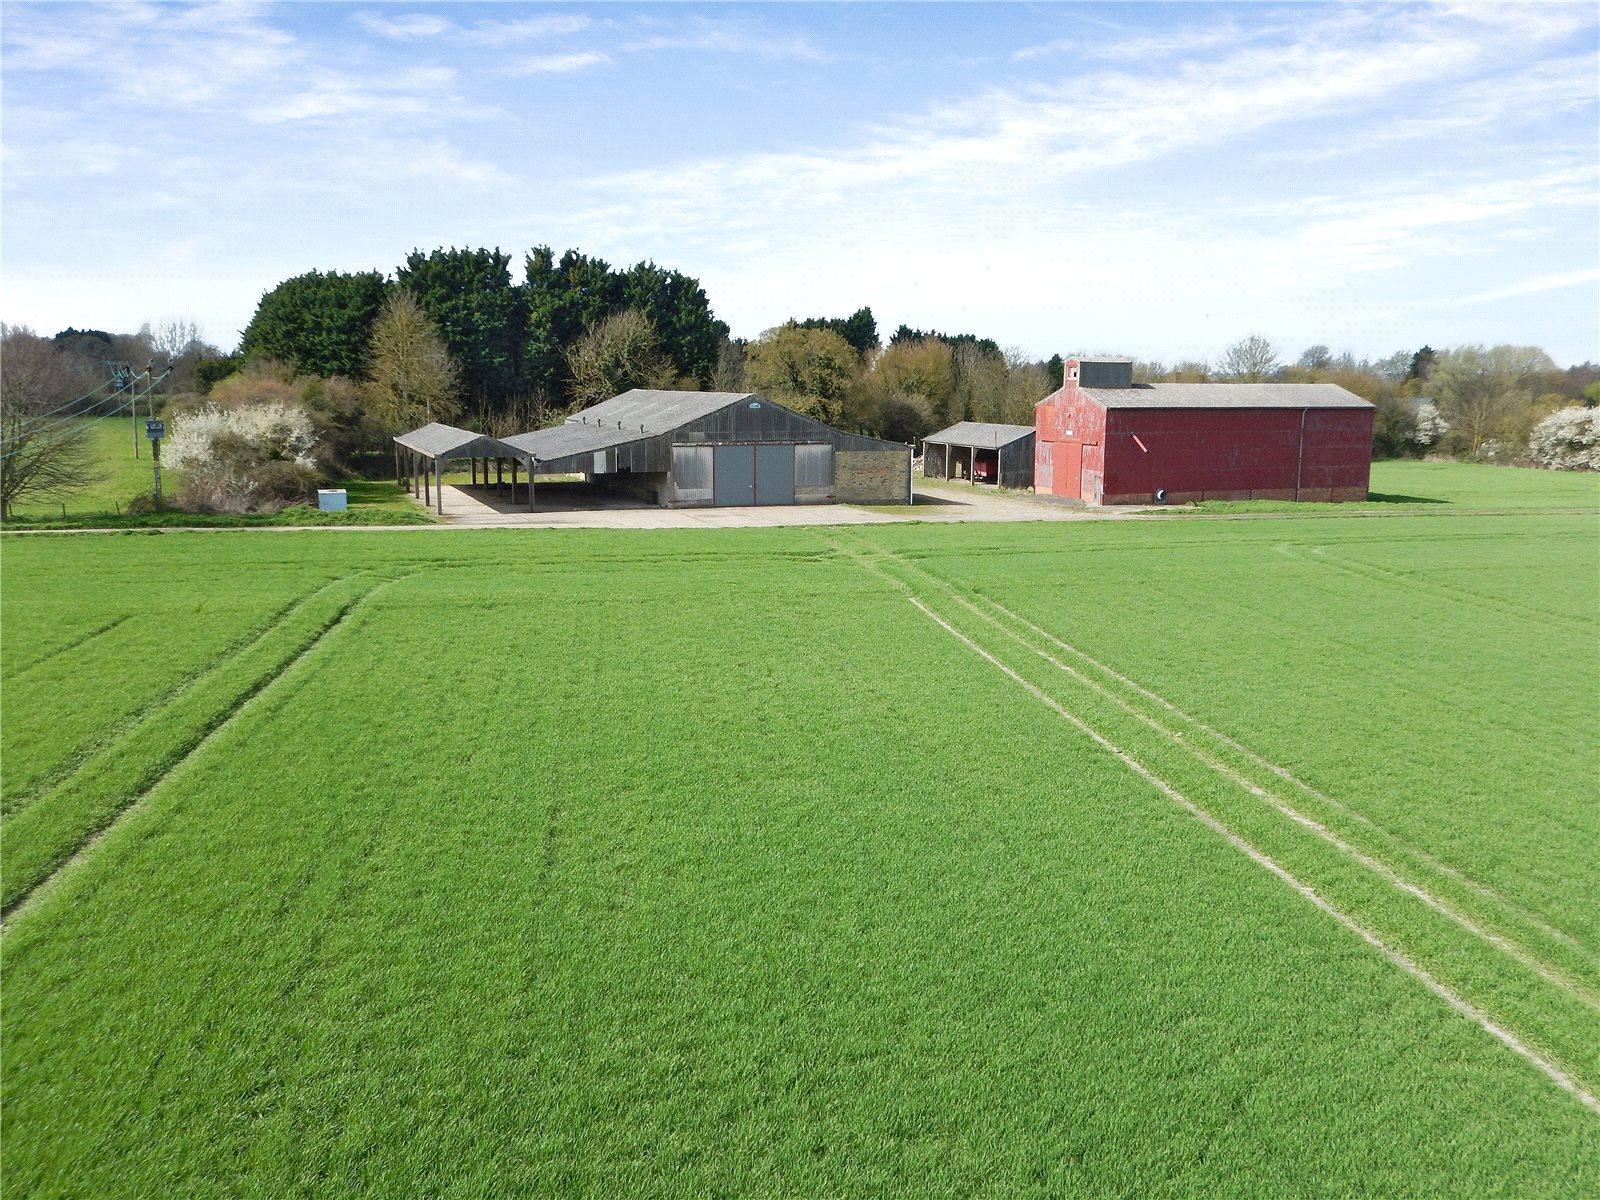 Fazenda / Rancho / Plantação para Venda às West Lane, Pirton, Hitchin, Hertfordshire, SG5 Hitchin, Inglaterra